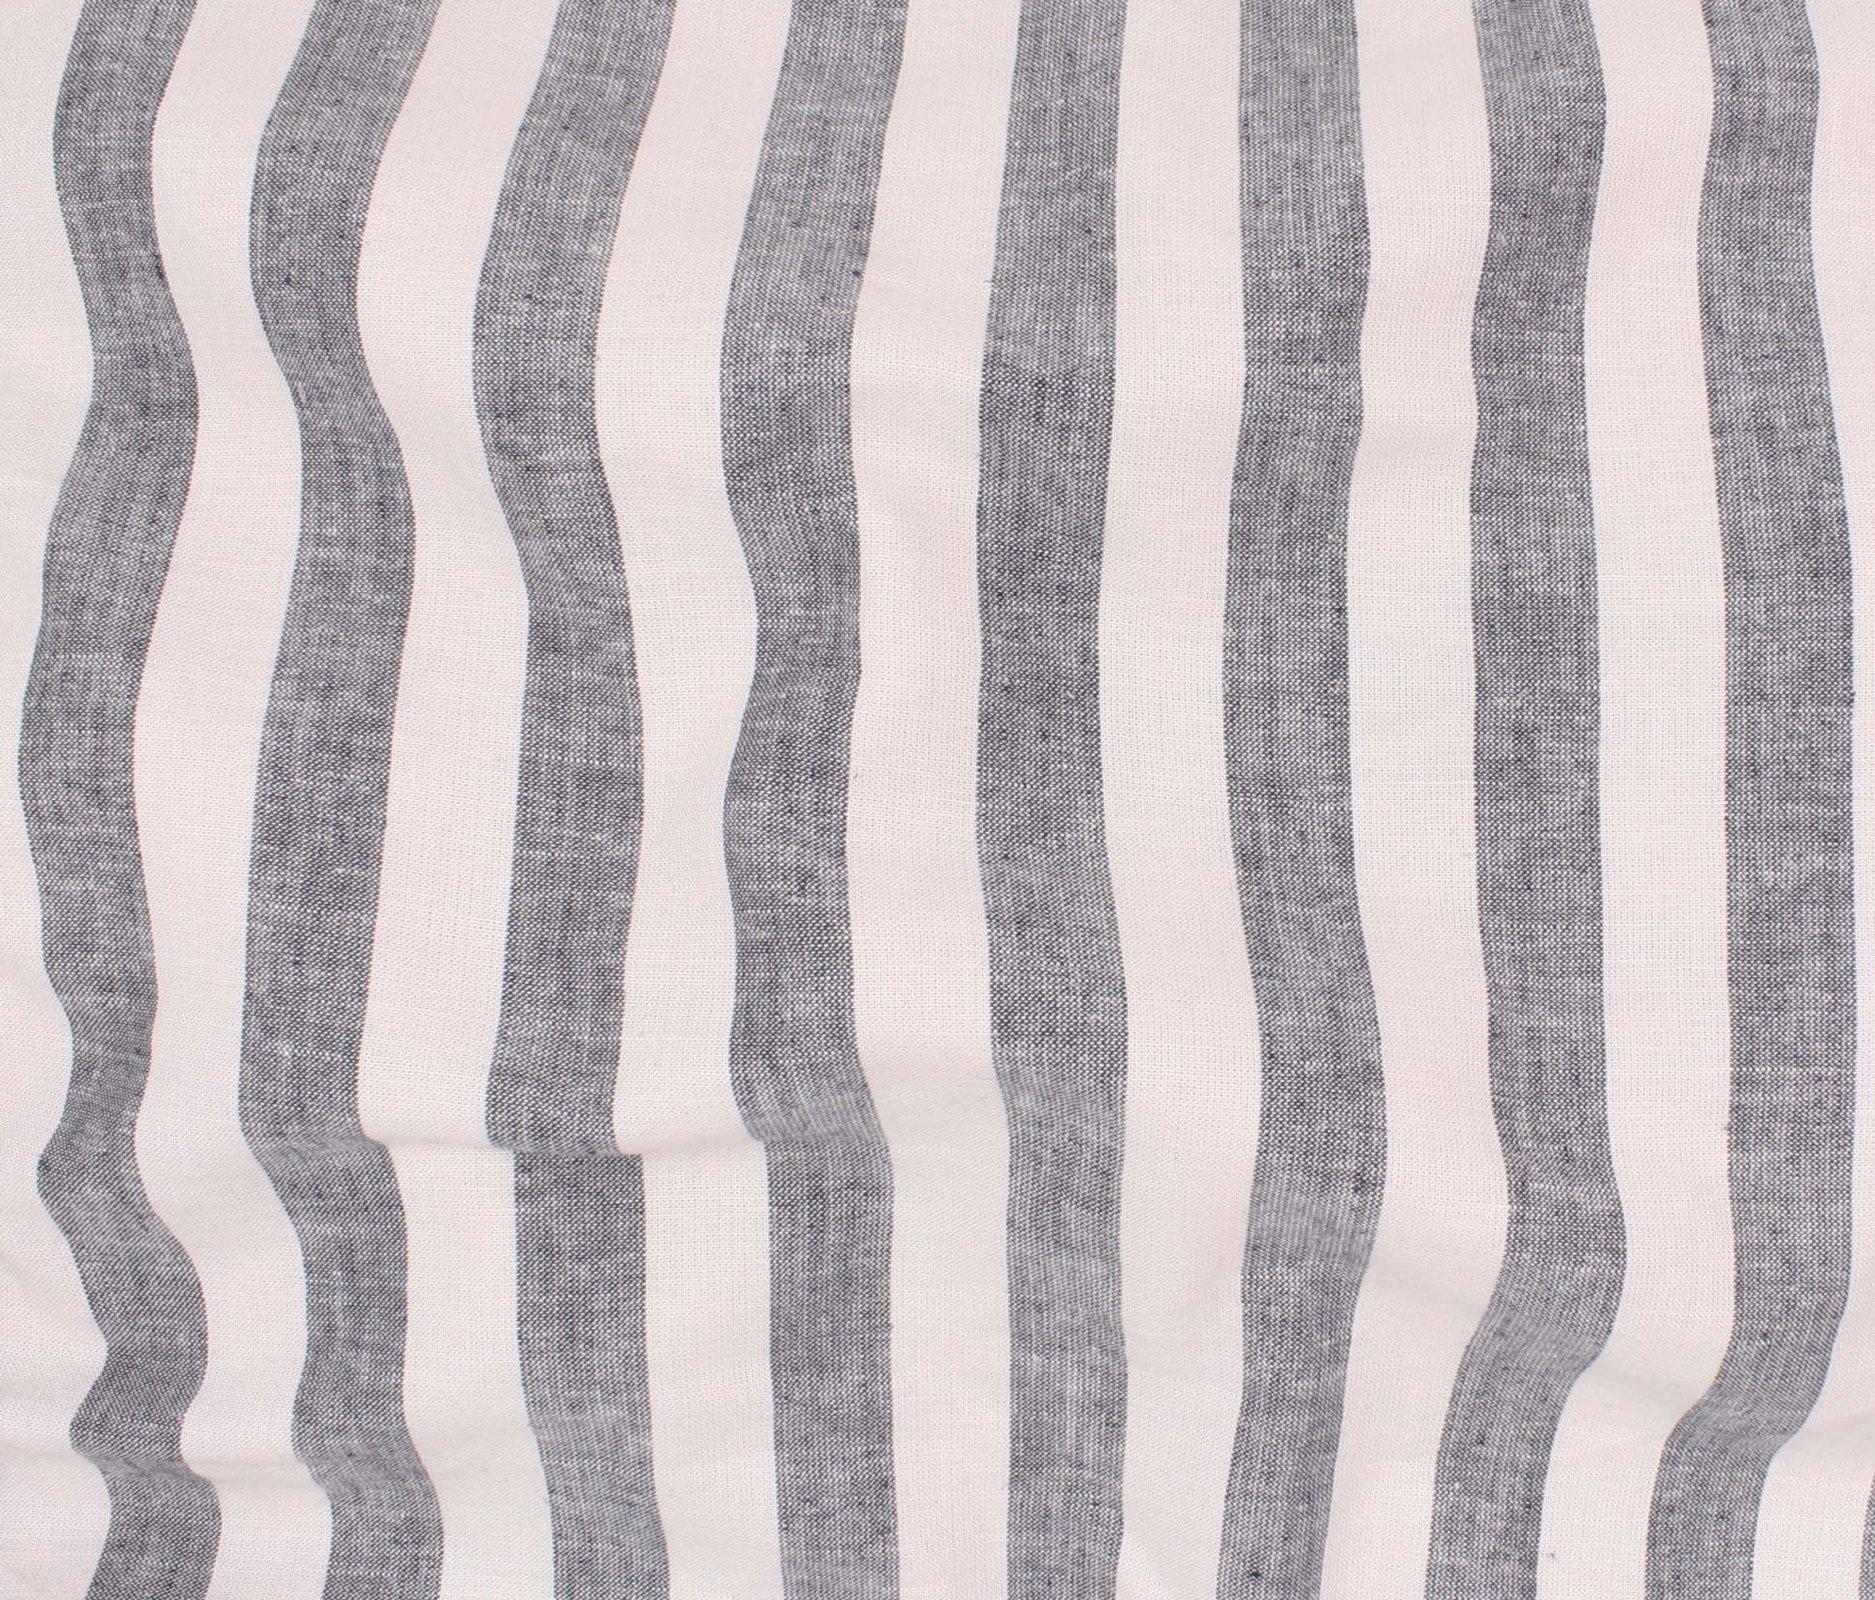 Summer Stripe Rayon/Linen - Black/White